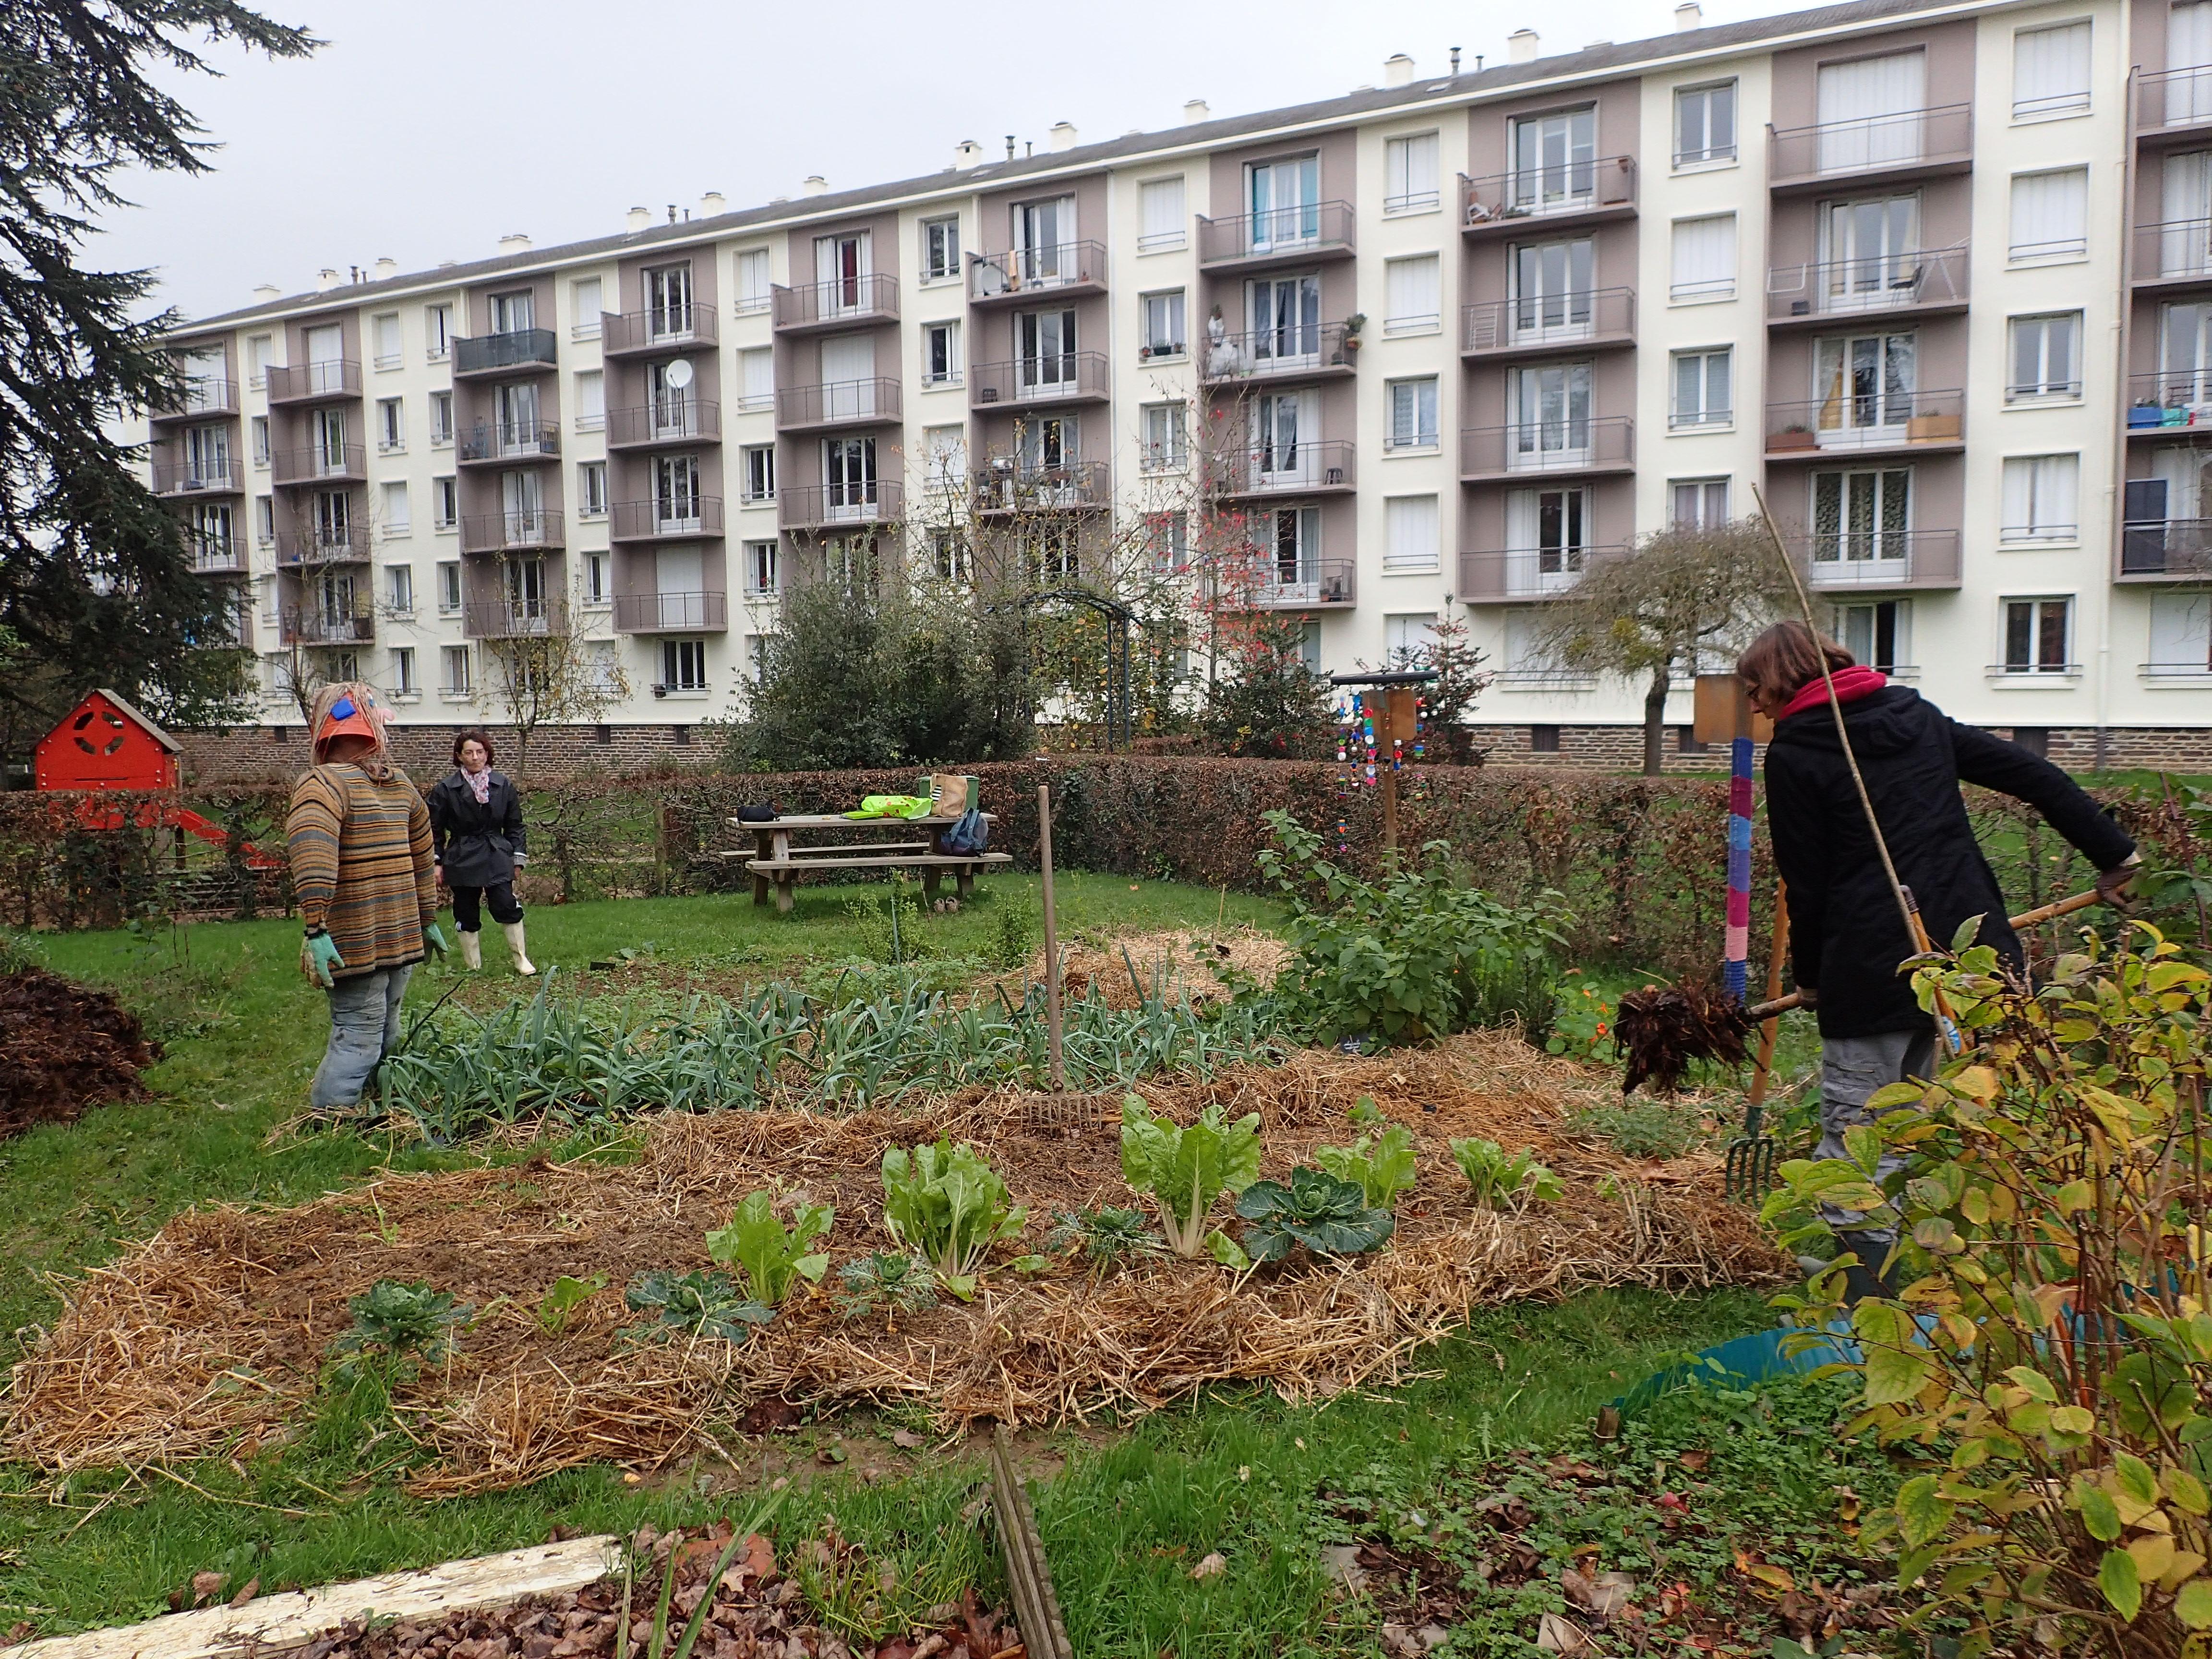 jardins du bonheur le bonheur est dans le jardin rennes vert le jardin. Black Bedroom Furniture Sets. Home Design Ideas